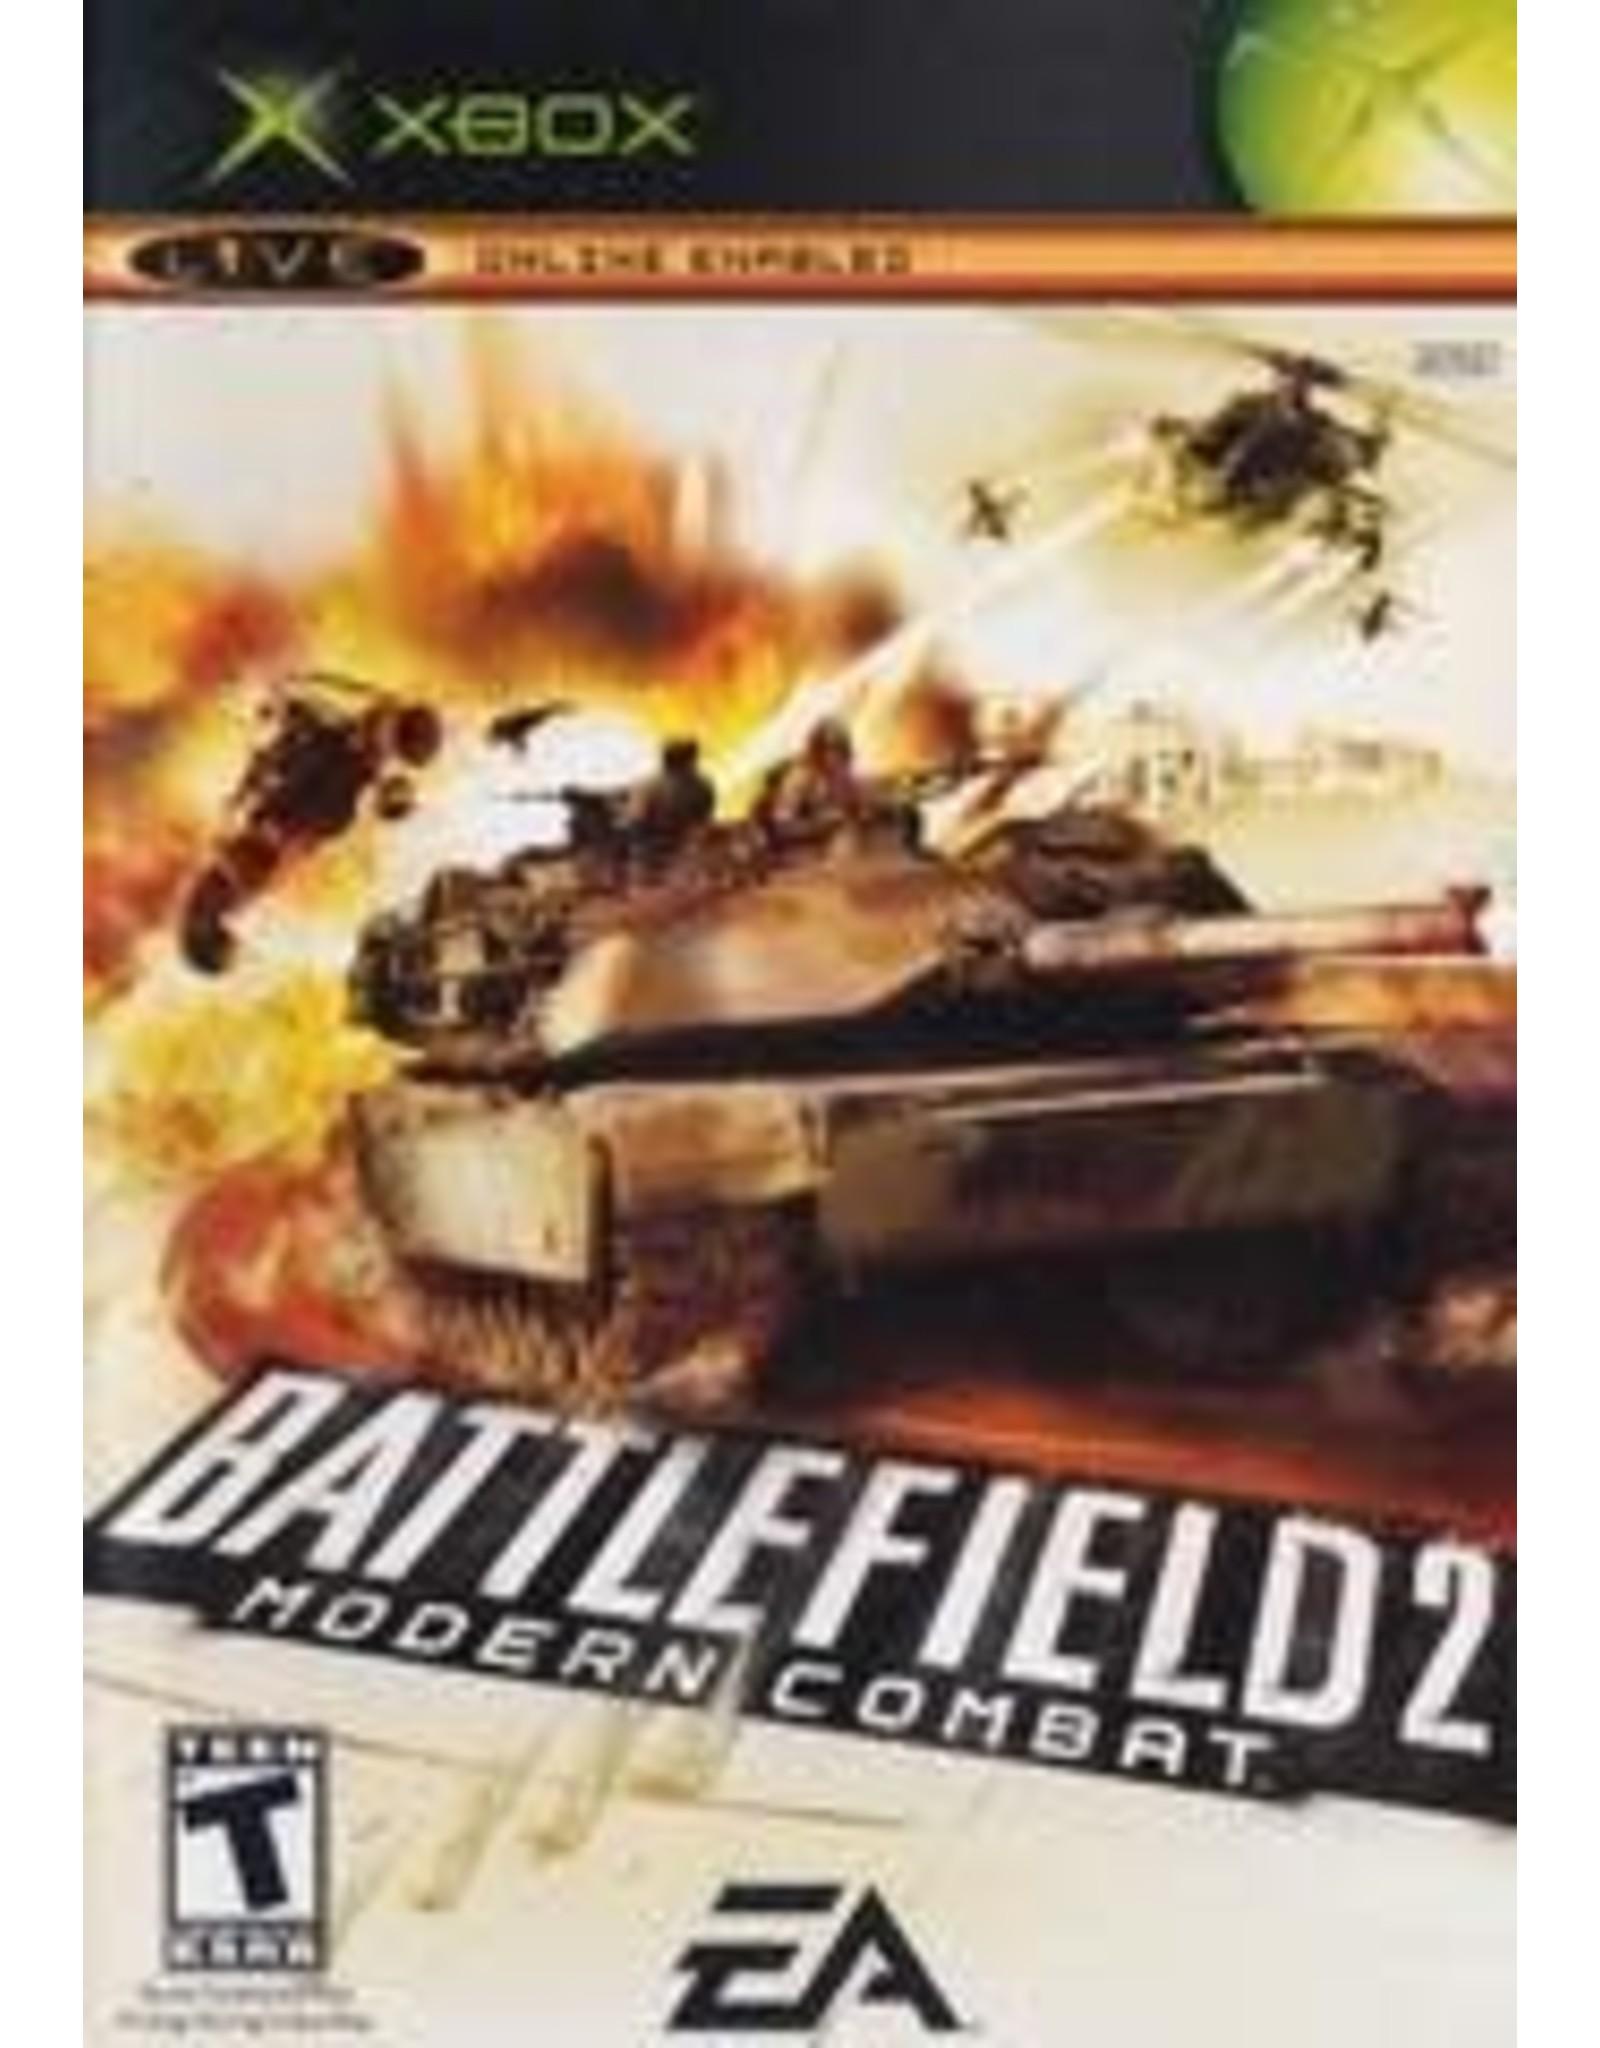 Xbox Battlefield 2 Modern Combat (No Manual)